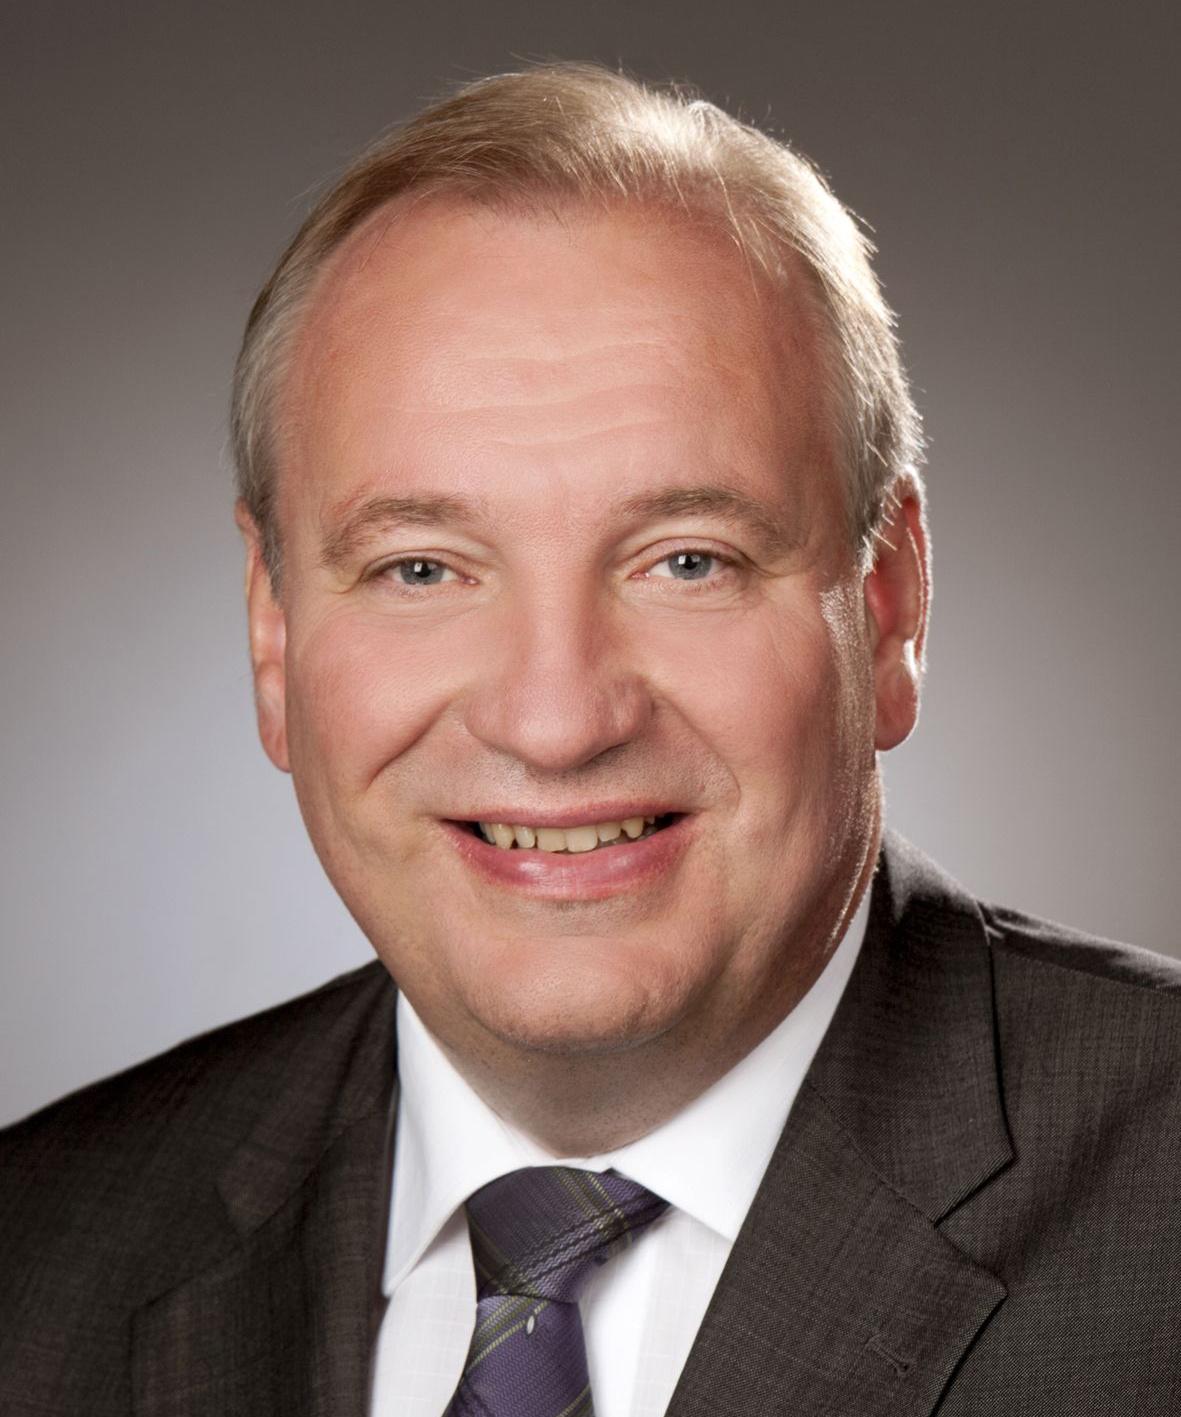 Franz Löffler